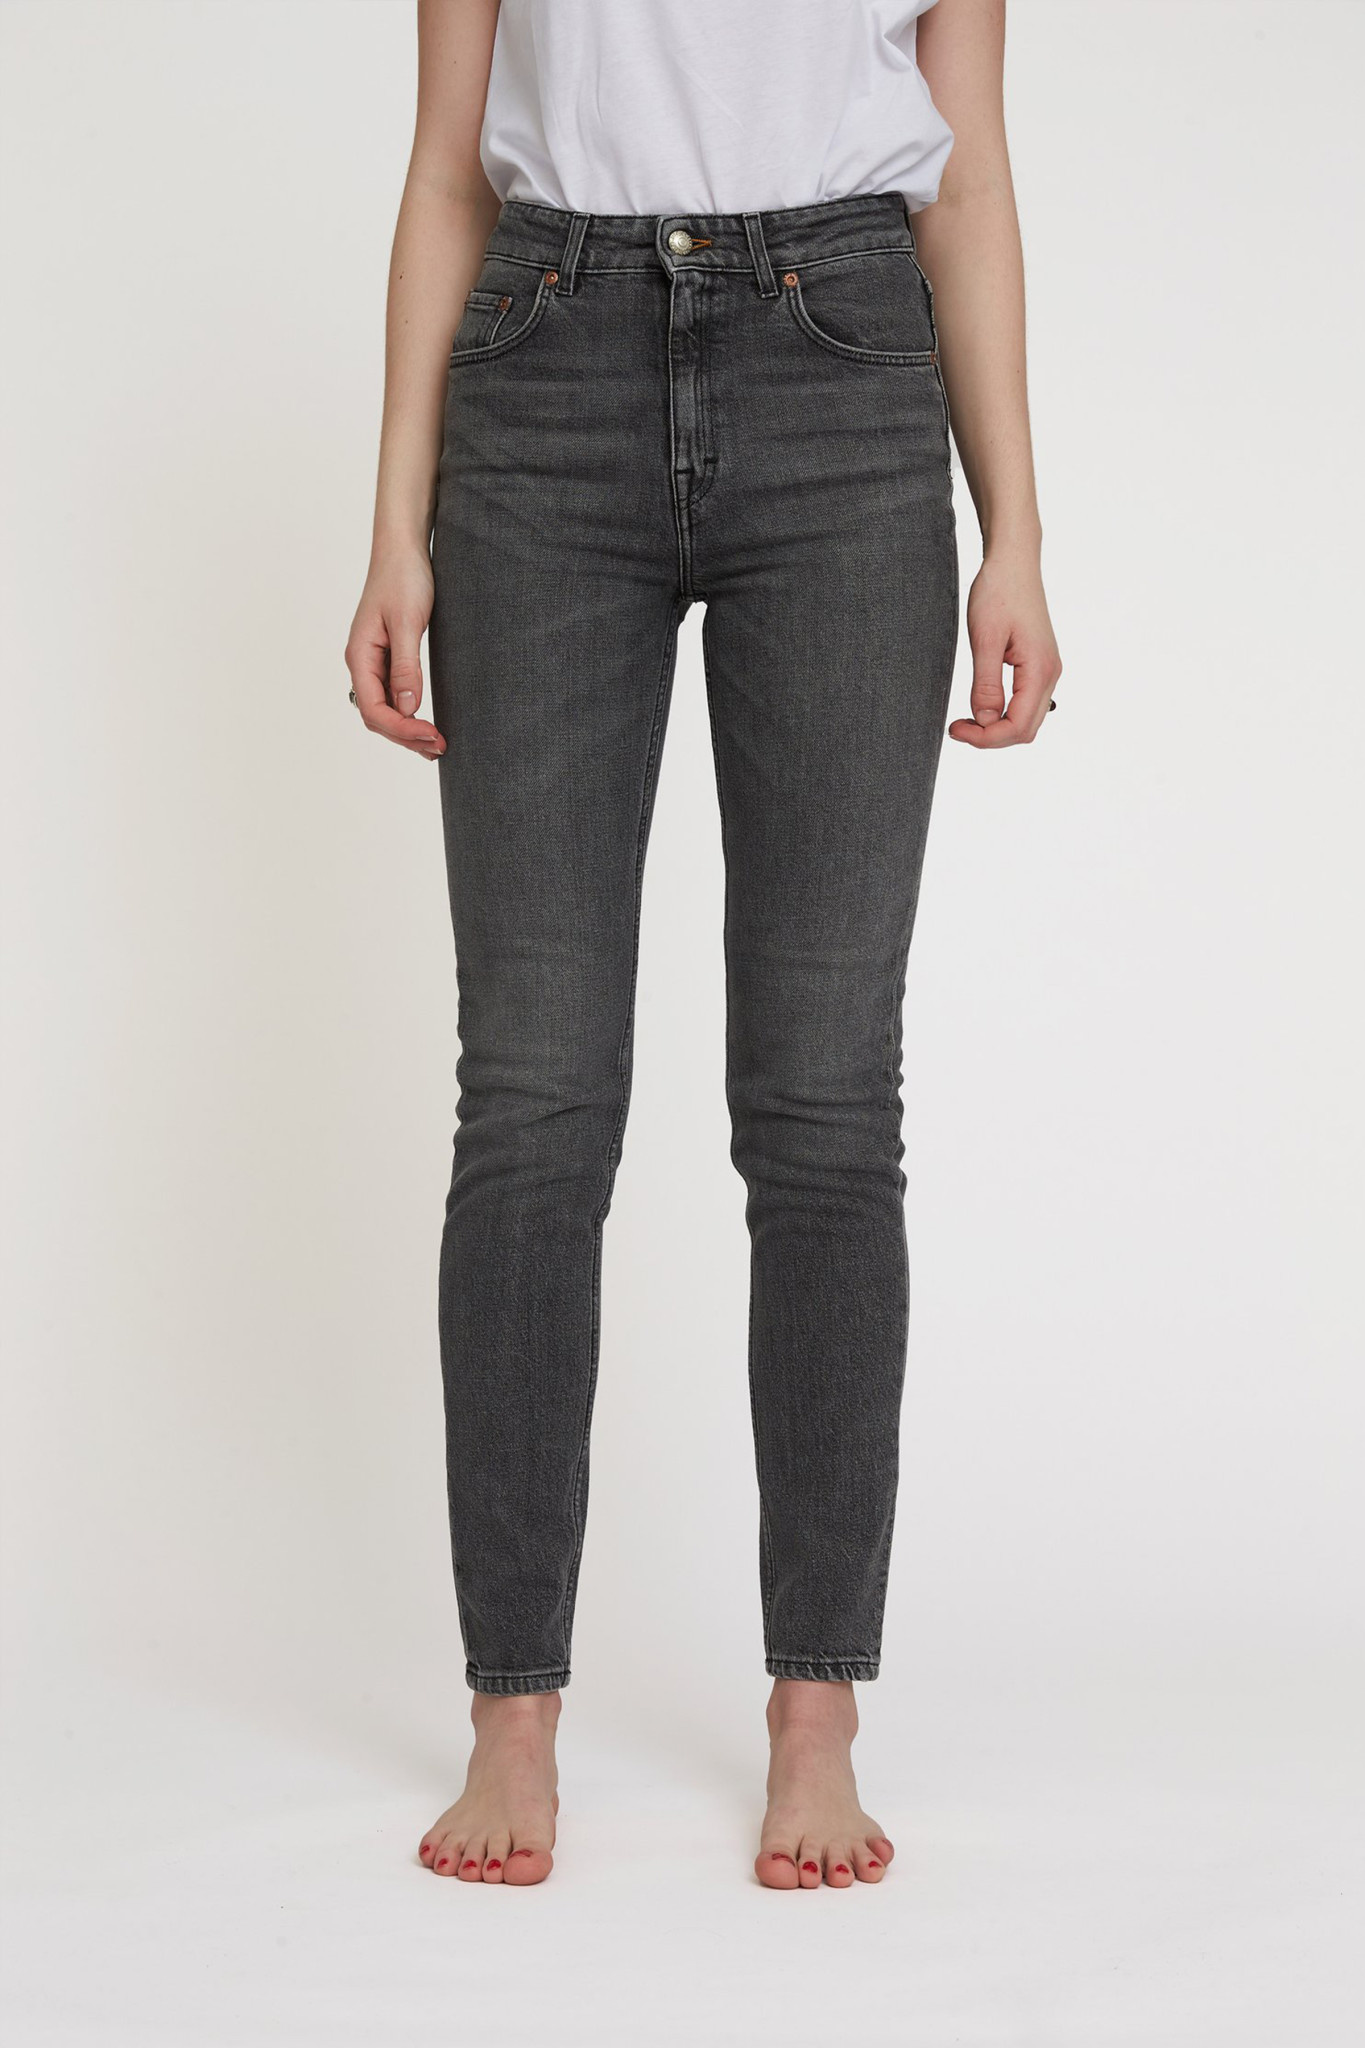 Marilyn B Jeans - Clean Black 8-1